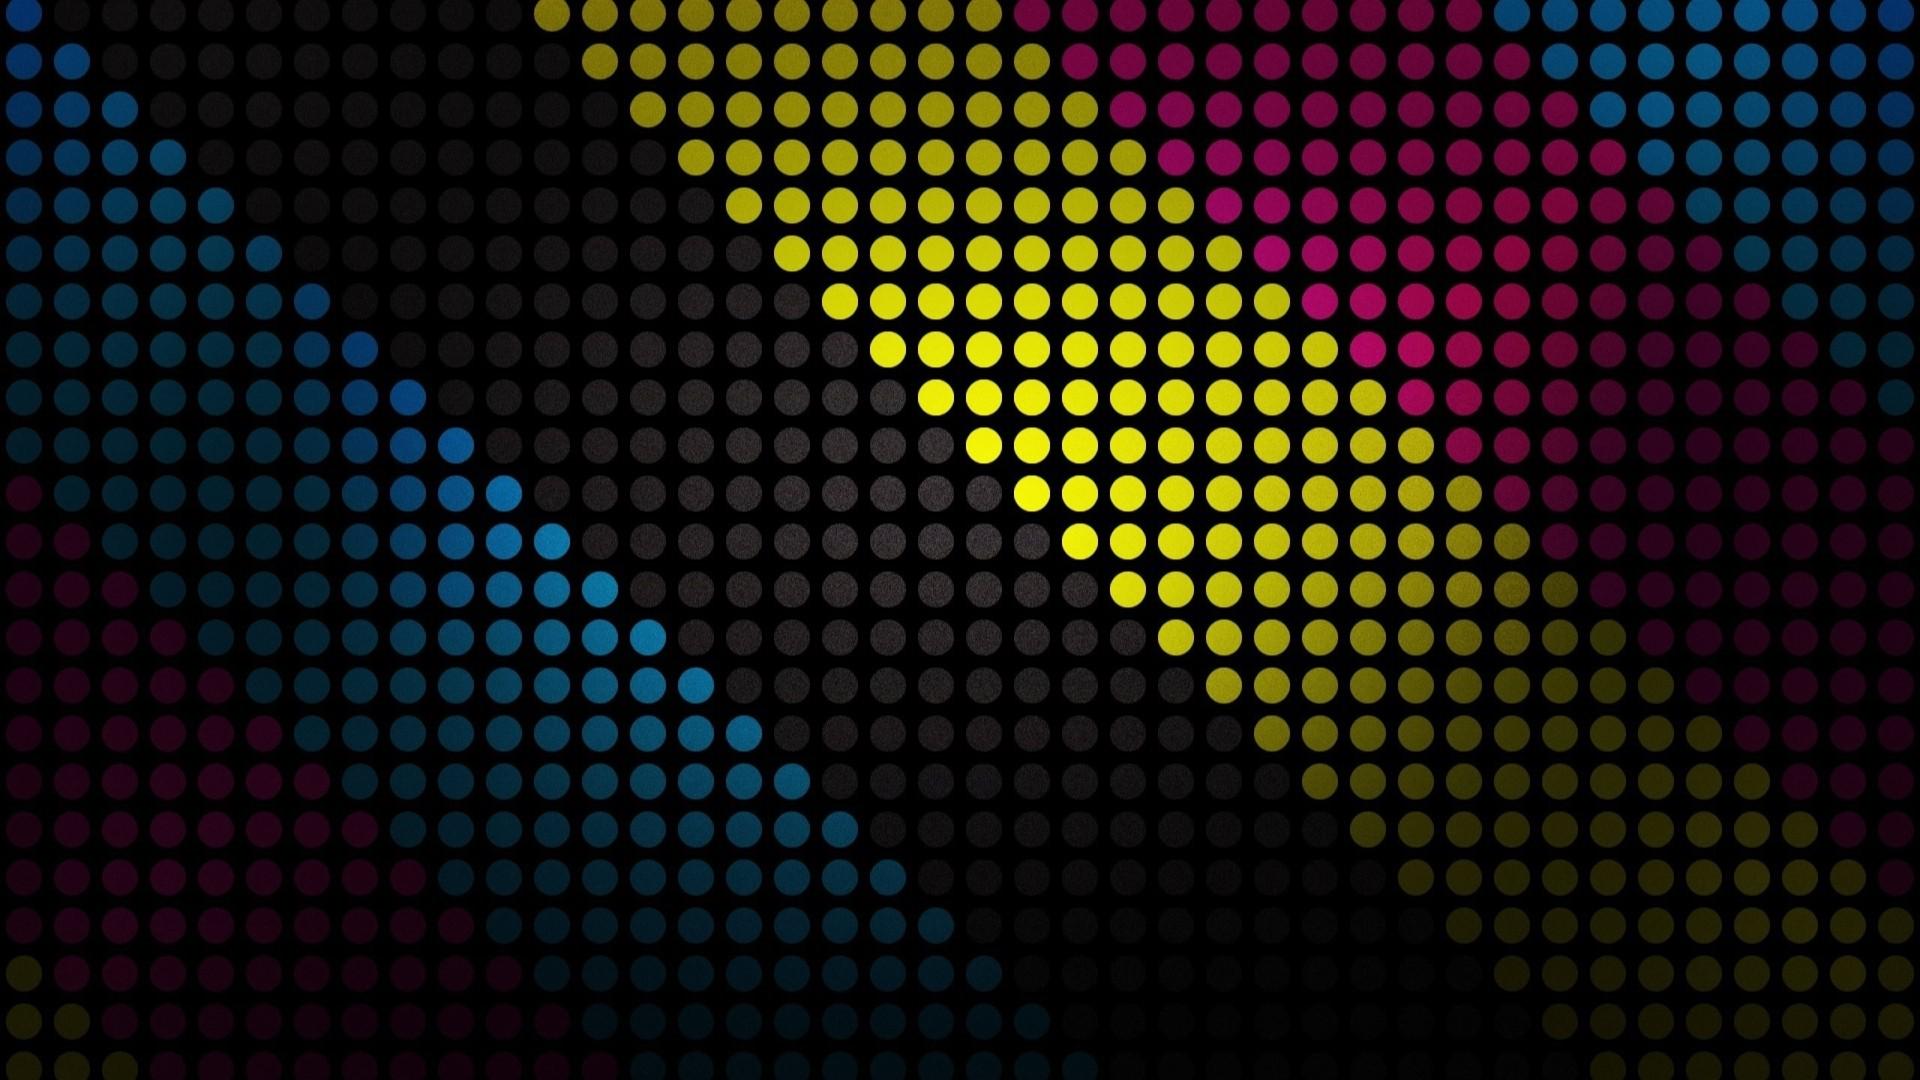 Digital Art Artwork Text Pattern Circle Polka Dots CMYK Color Shape Design Line Number Screenshot 1920x1080